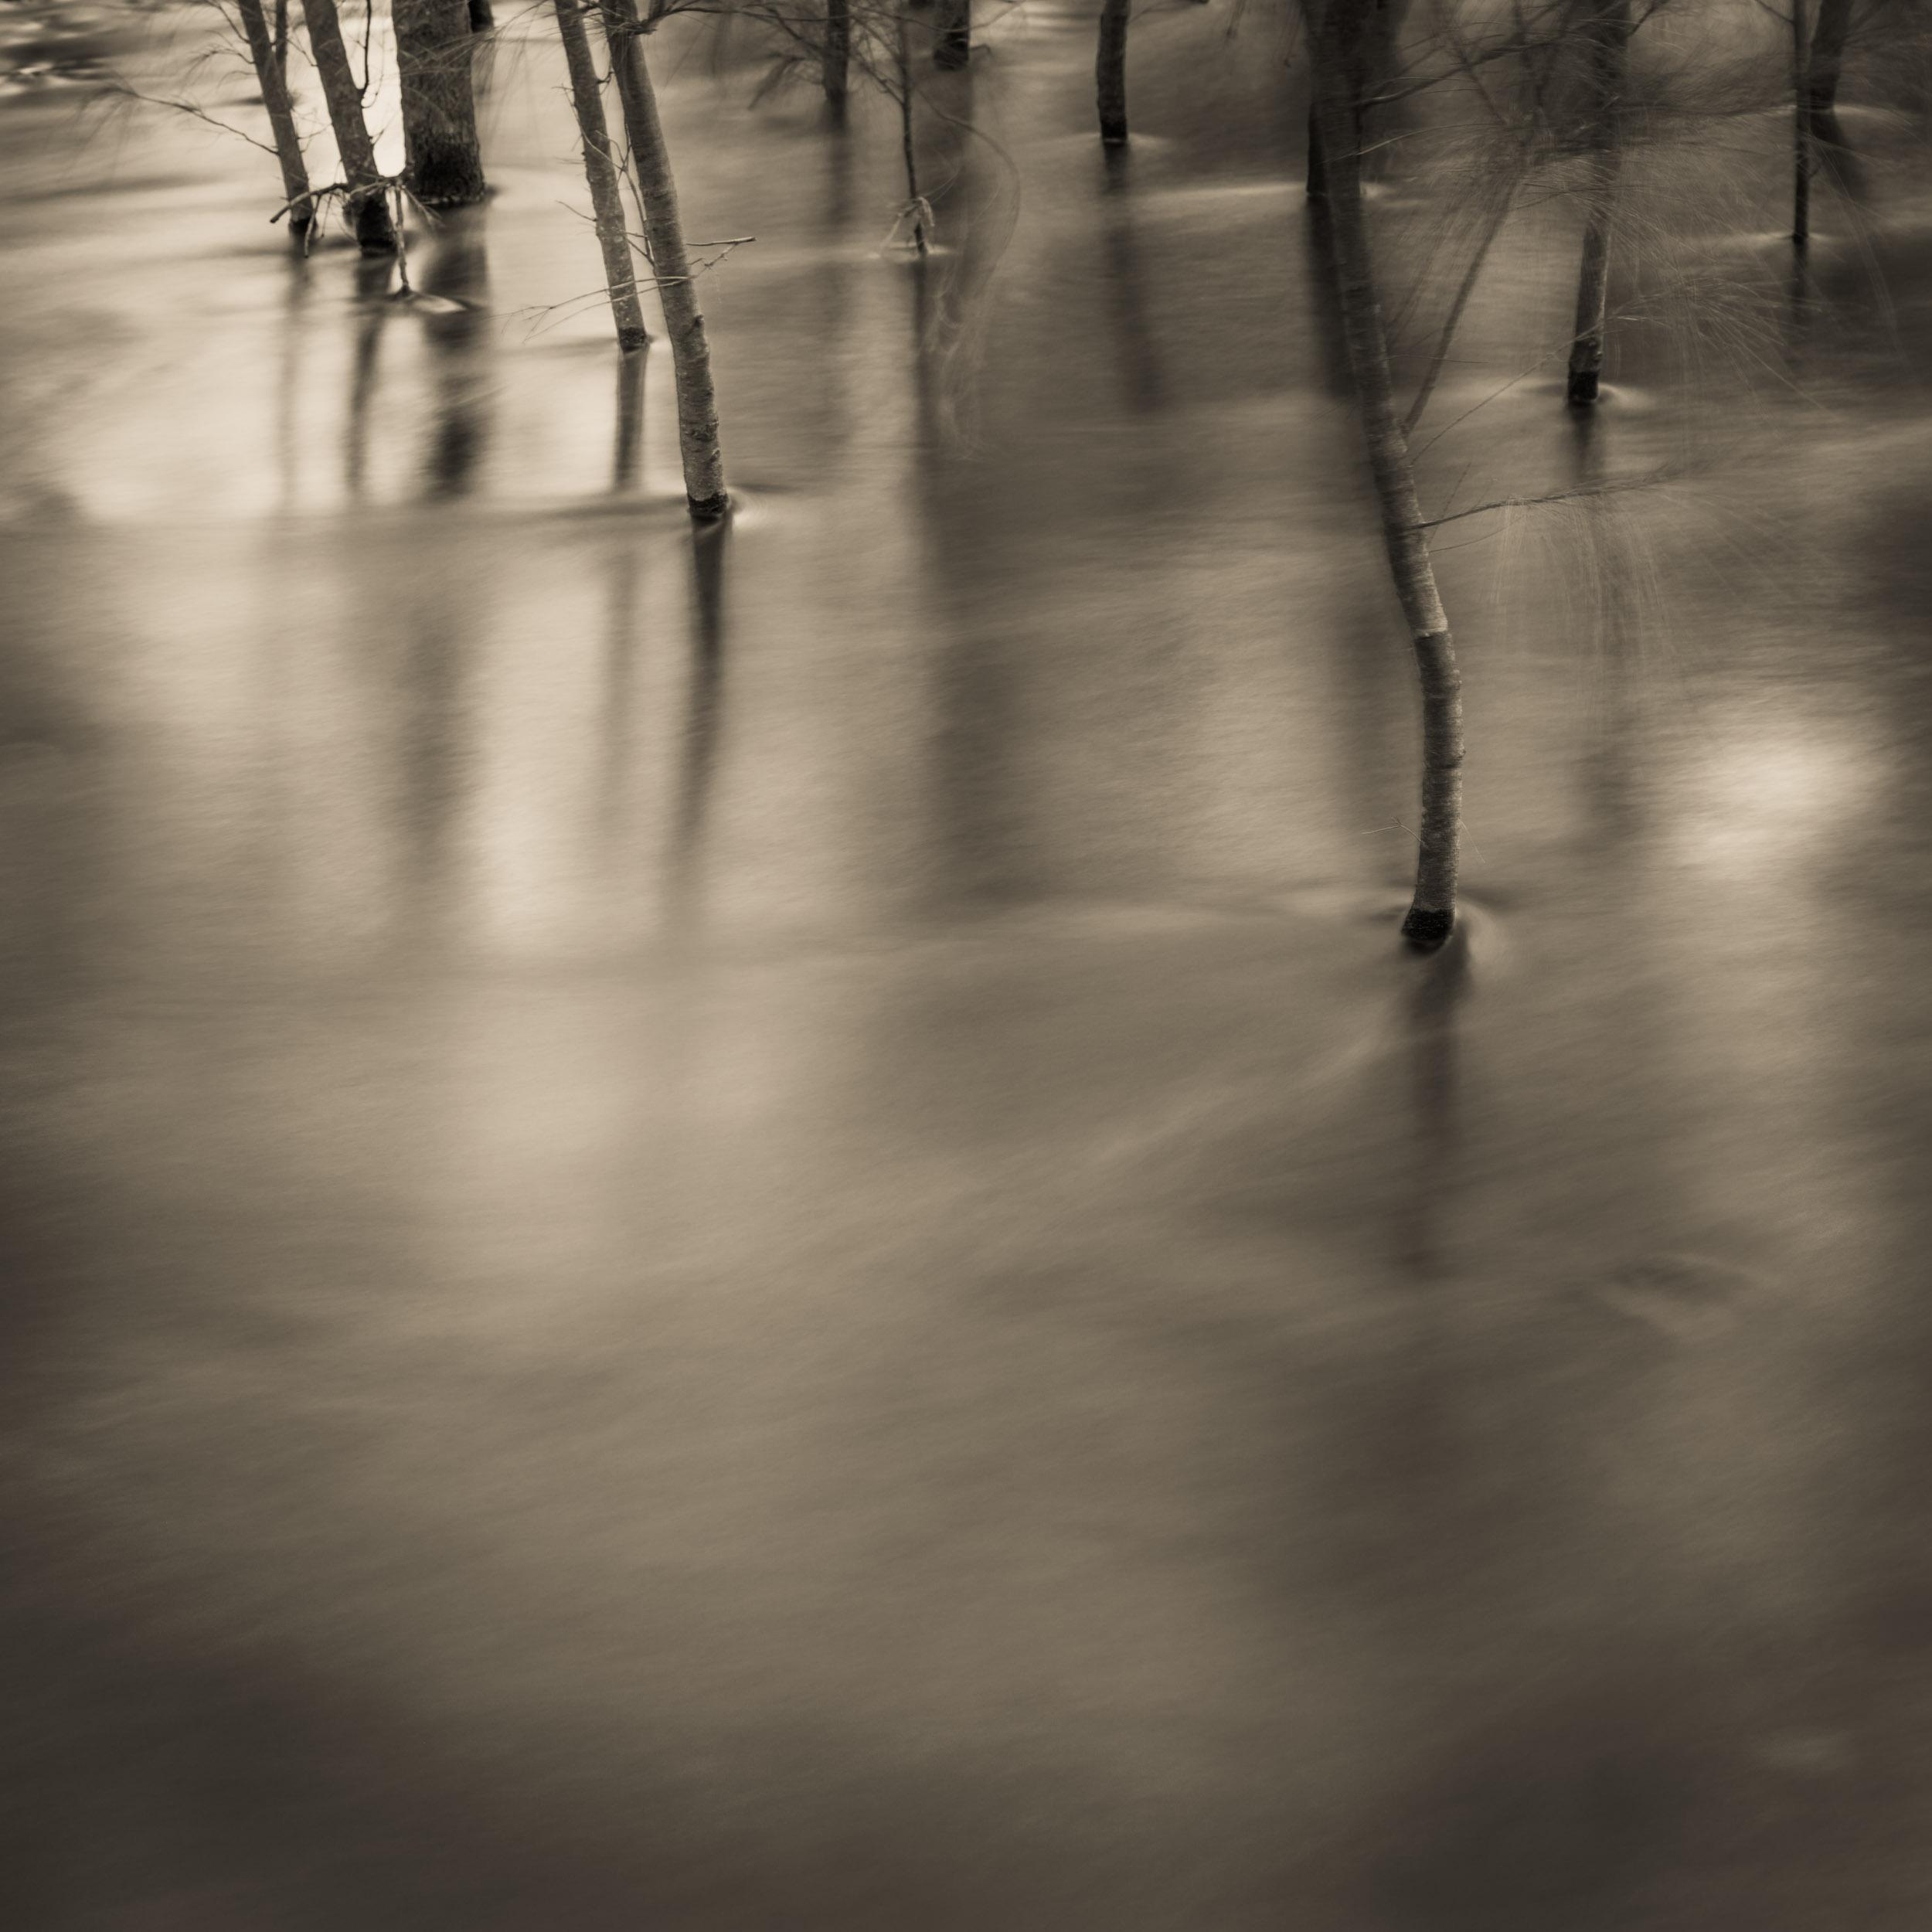 Shoalhaven River, bellow Tallowa Dam in Kangaroo Valley Copyright © Len Metcalf 2017